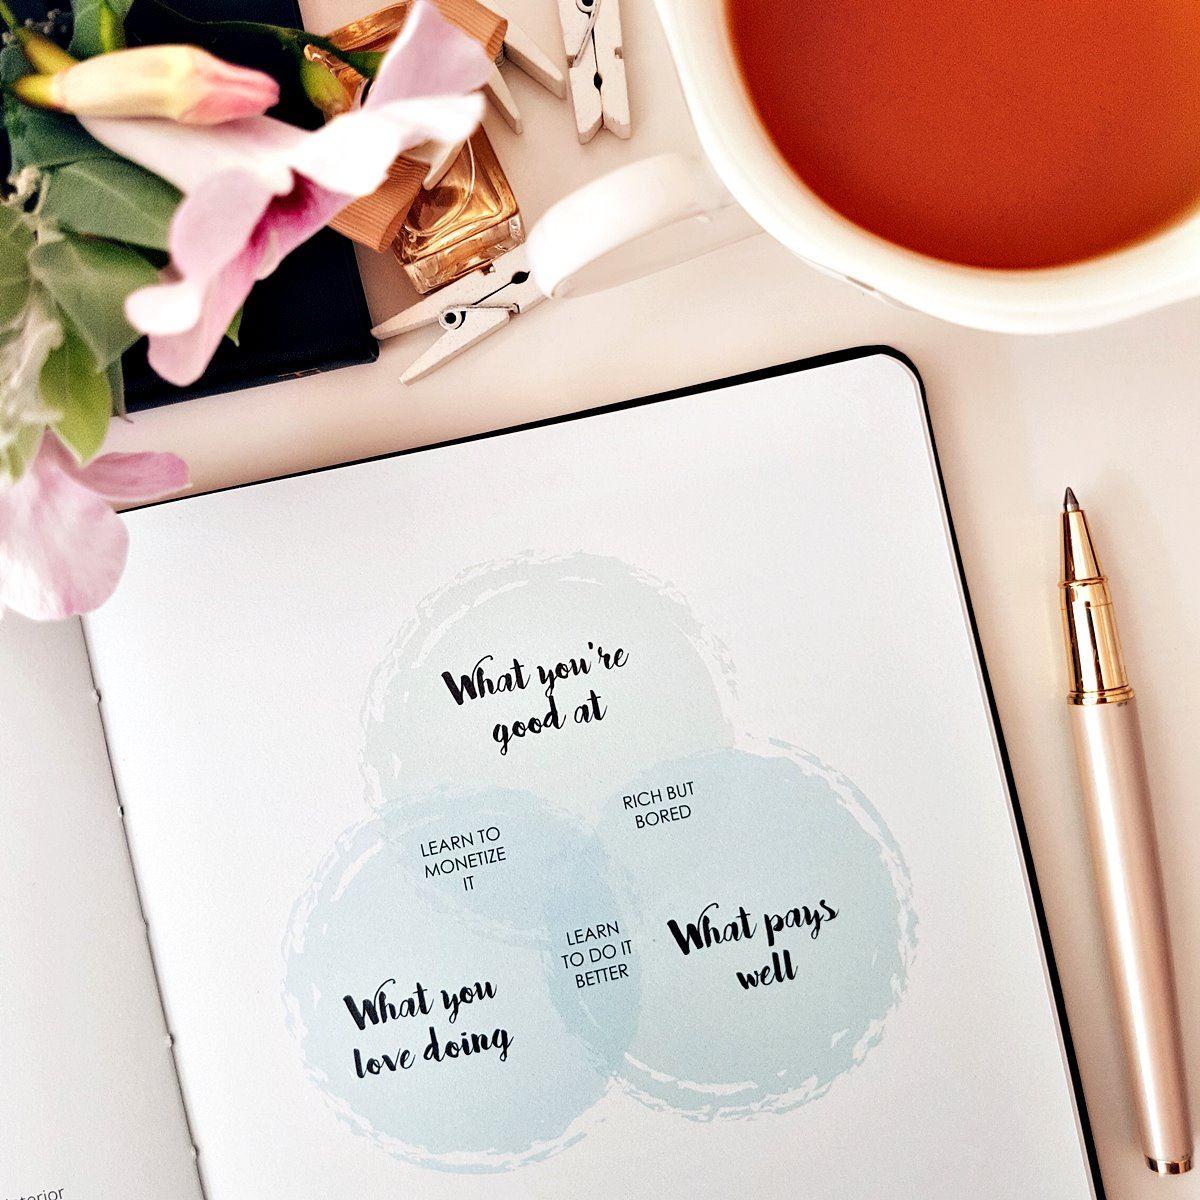 Make Your Mark Self-Coaching Journal